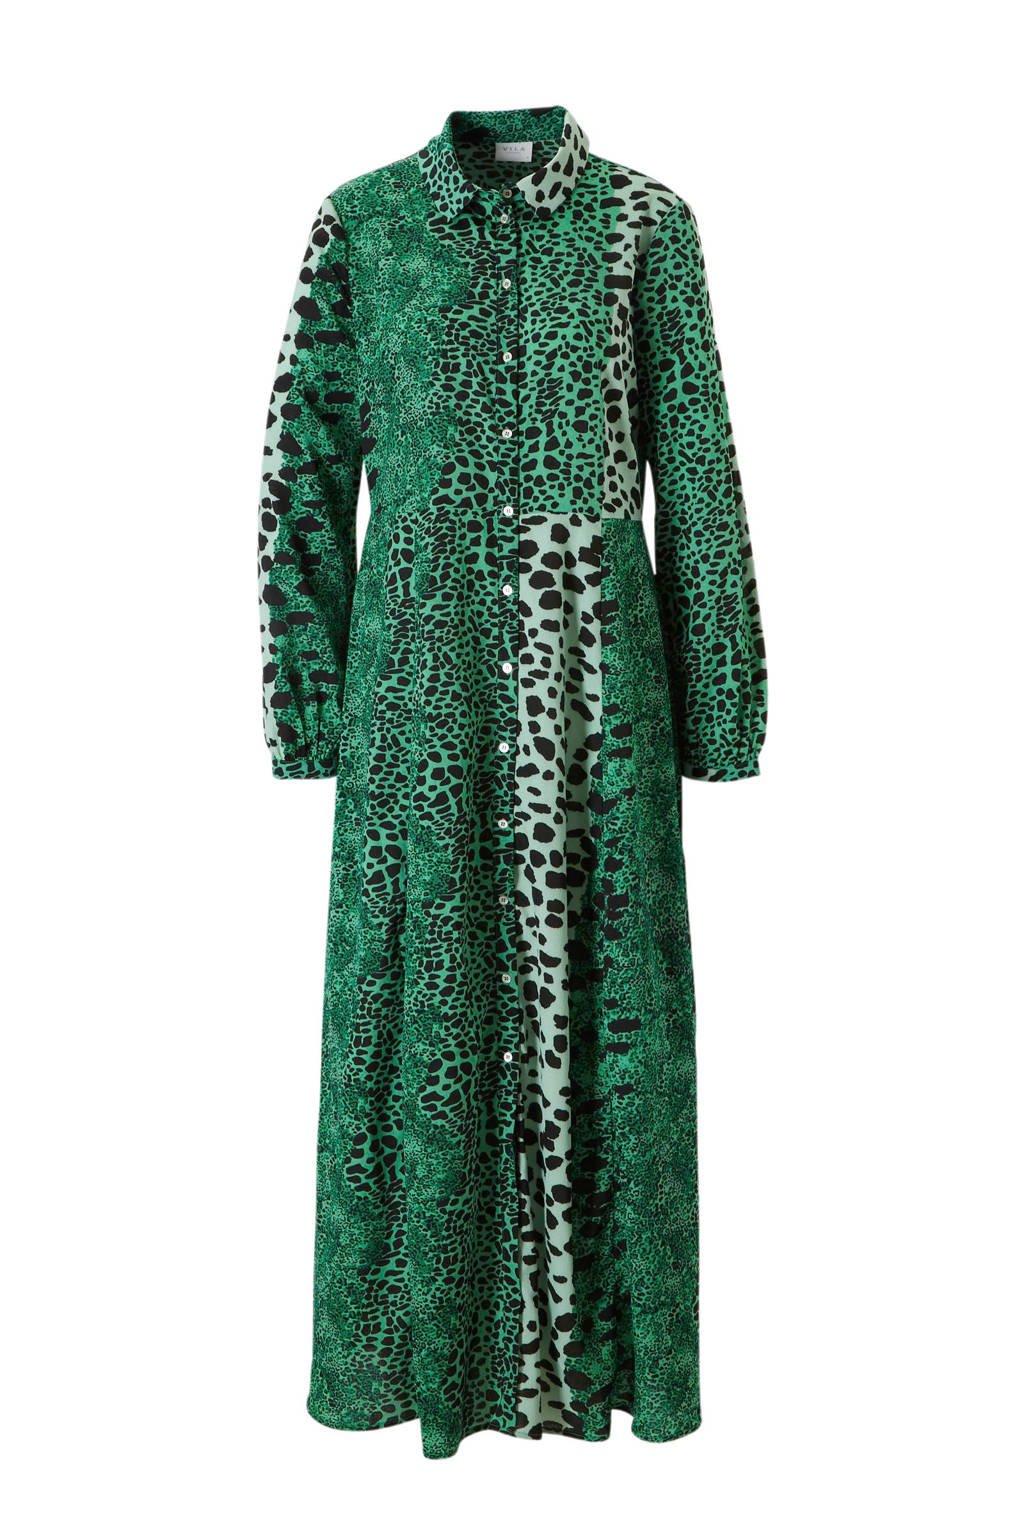 beste groothandel goedkoper gedetailleerde foto's blousejurk met panterprint groen/zwart